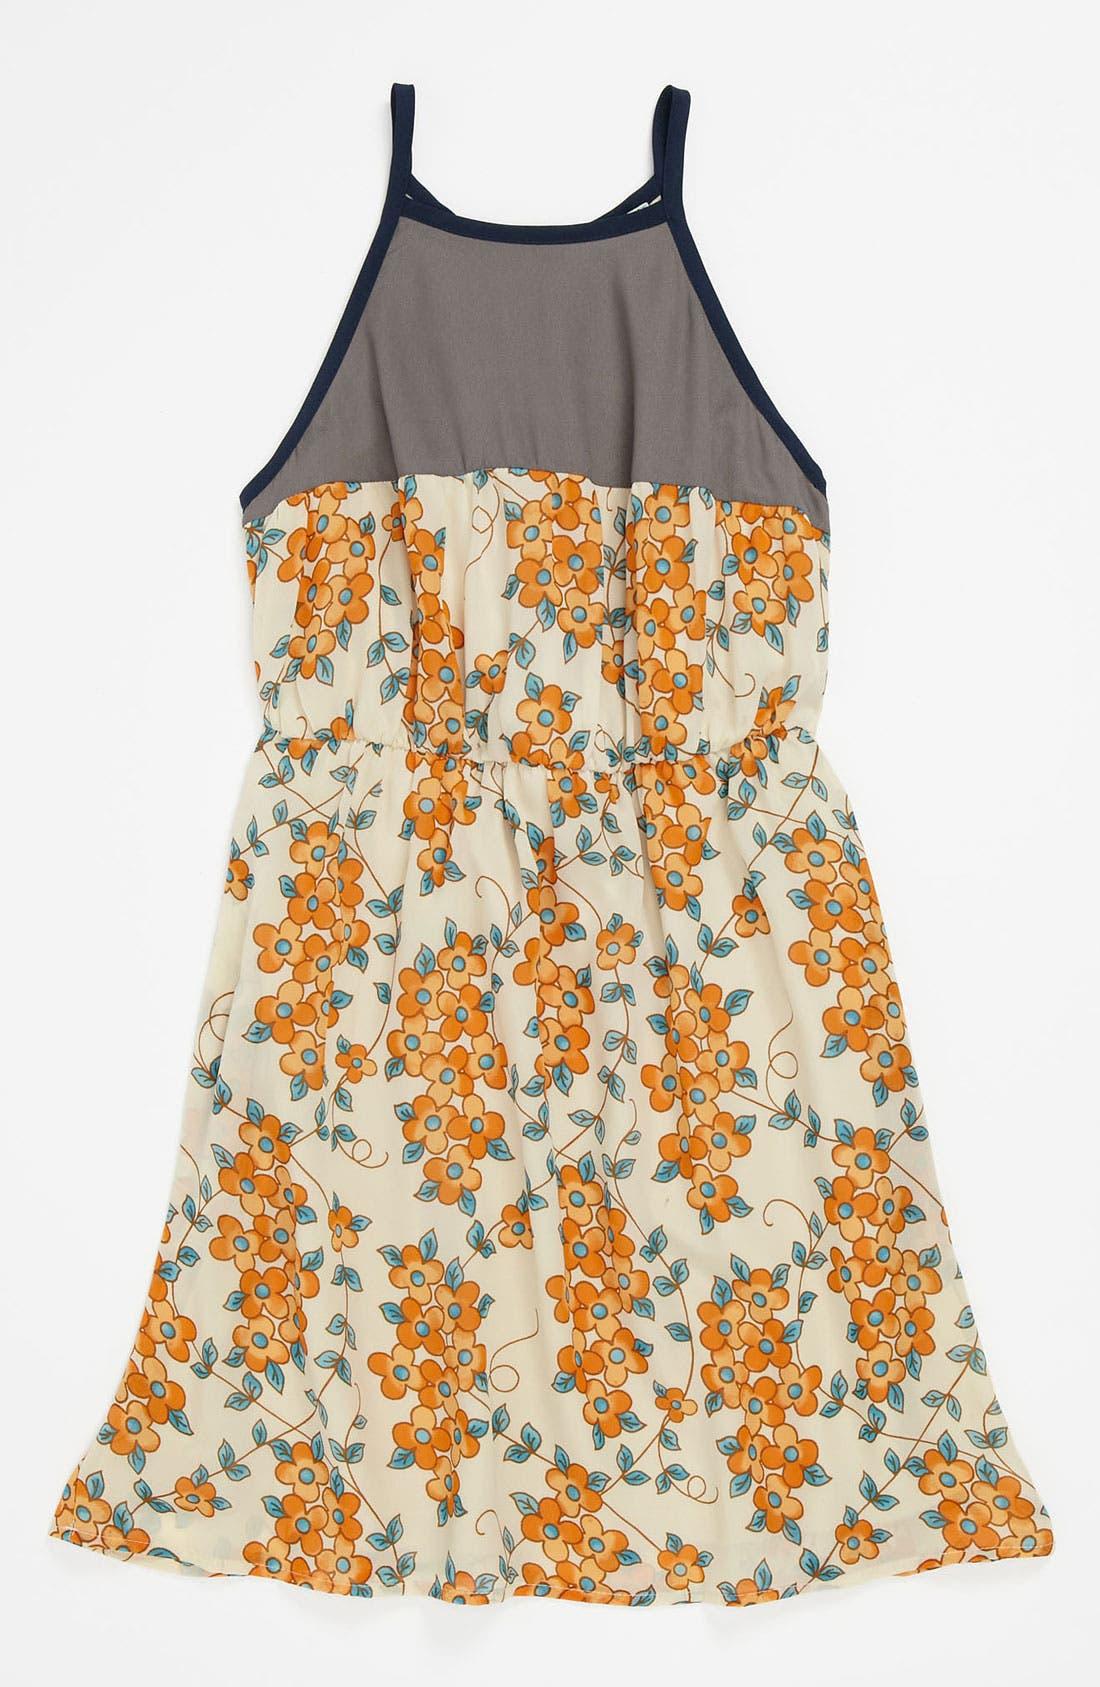 Alternate Image 1 Selected - Mia Chica Print Dress (Little Girls & Big Girls)